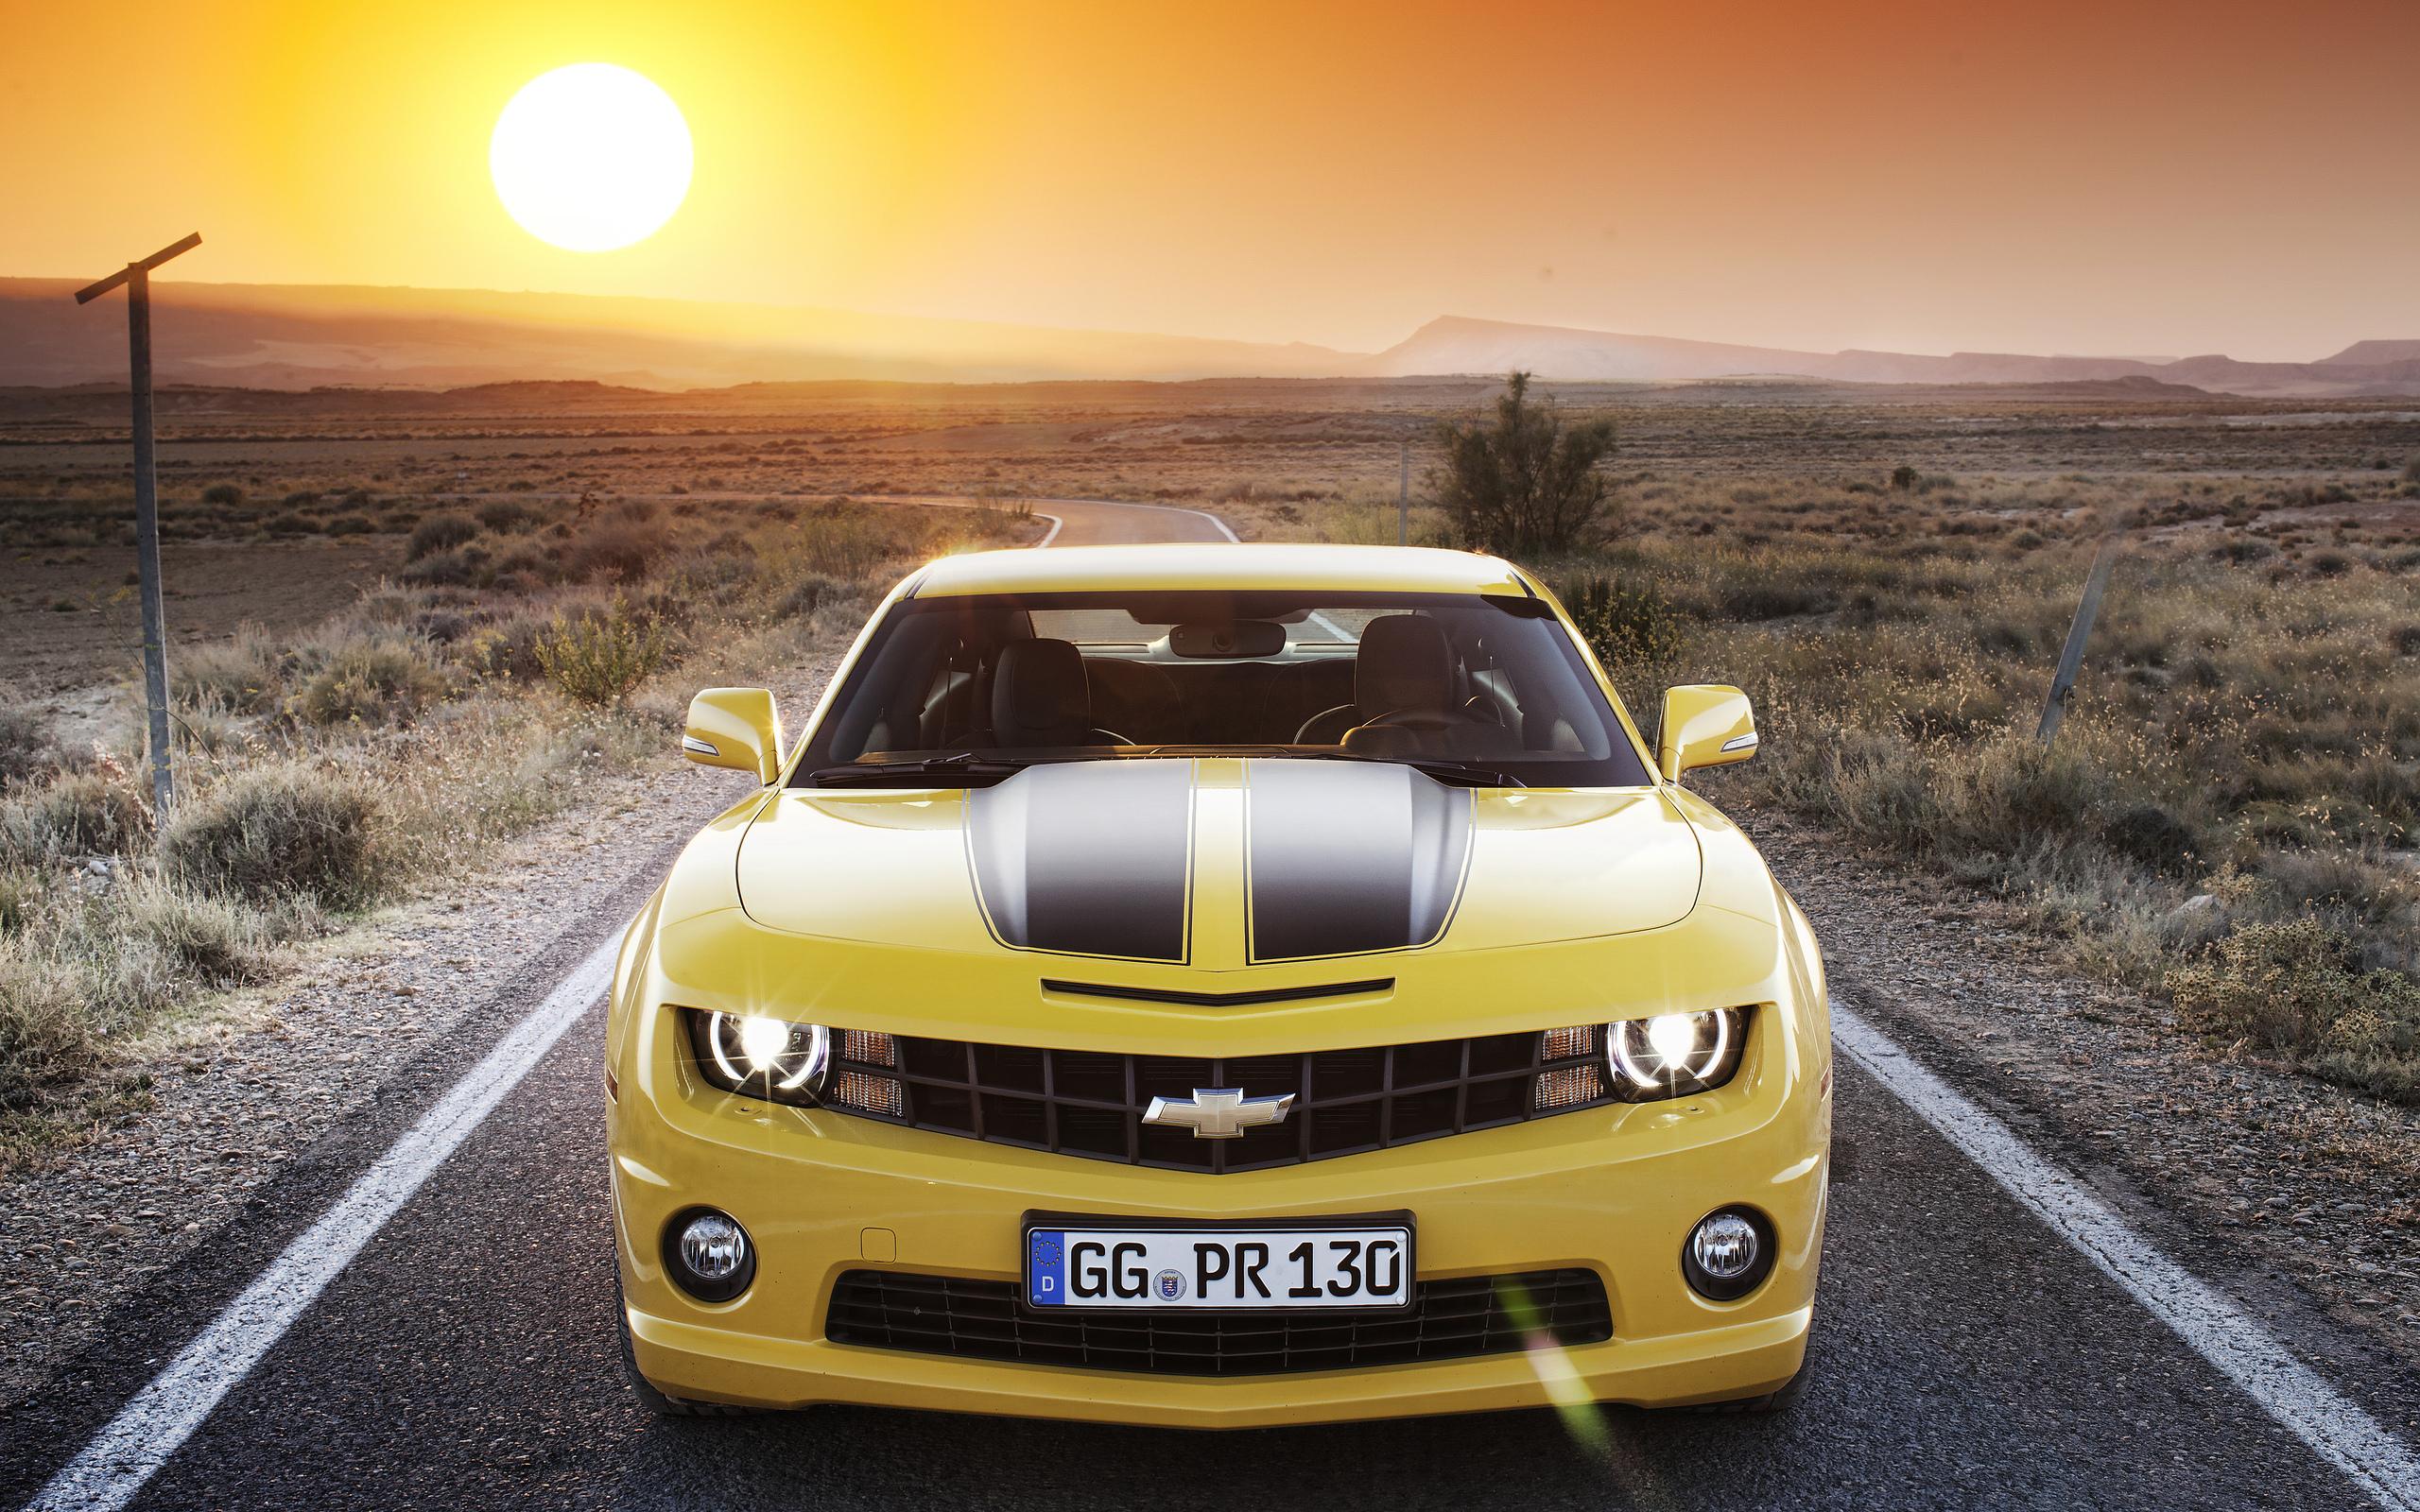 Chevrolet Camaro Fond Décran Hd Arrière Plan 2560x1600 Id